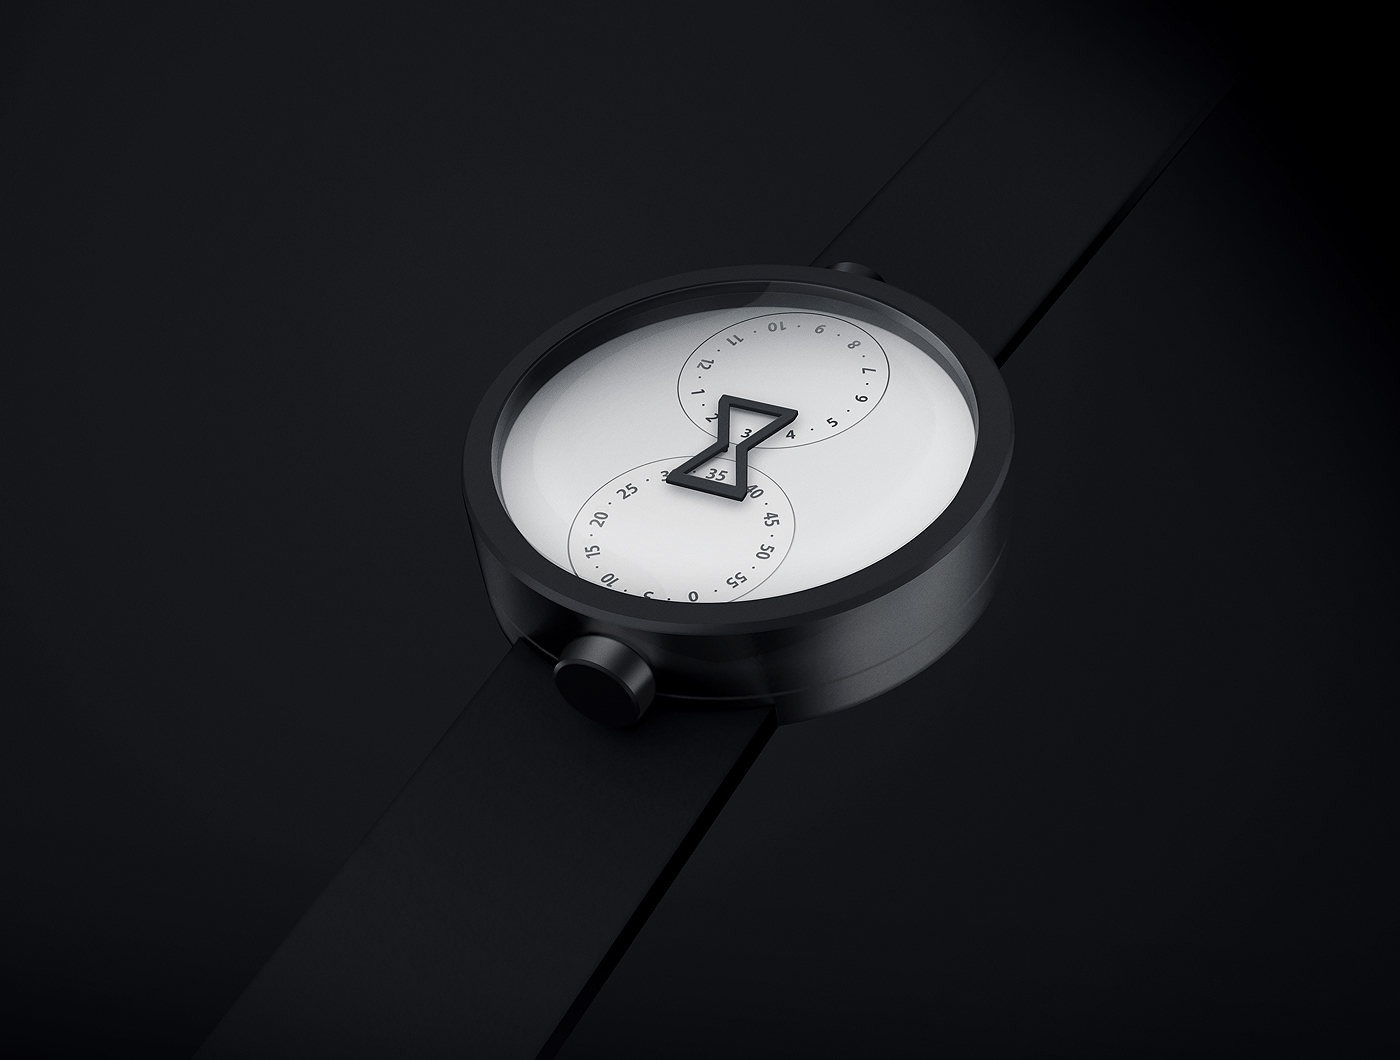 OZO-watch-coming-hisheji (1)